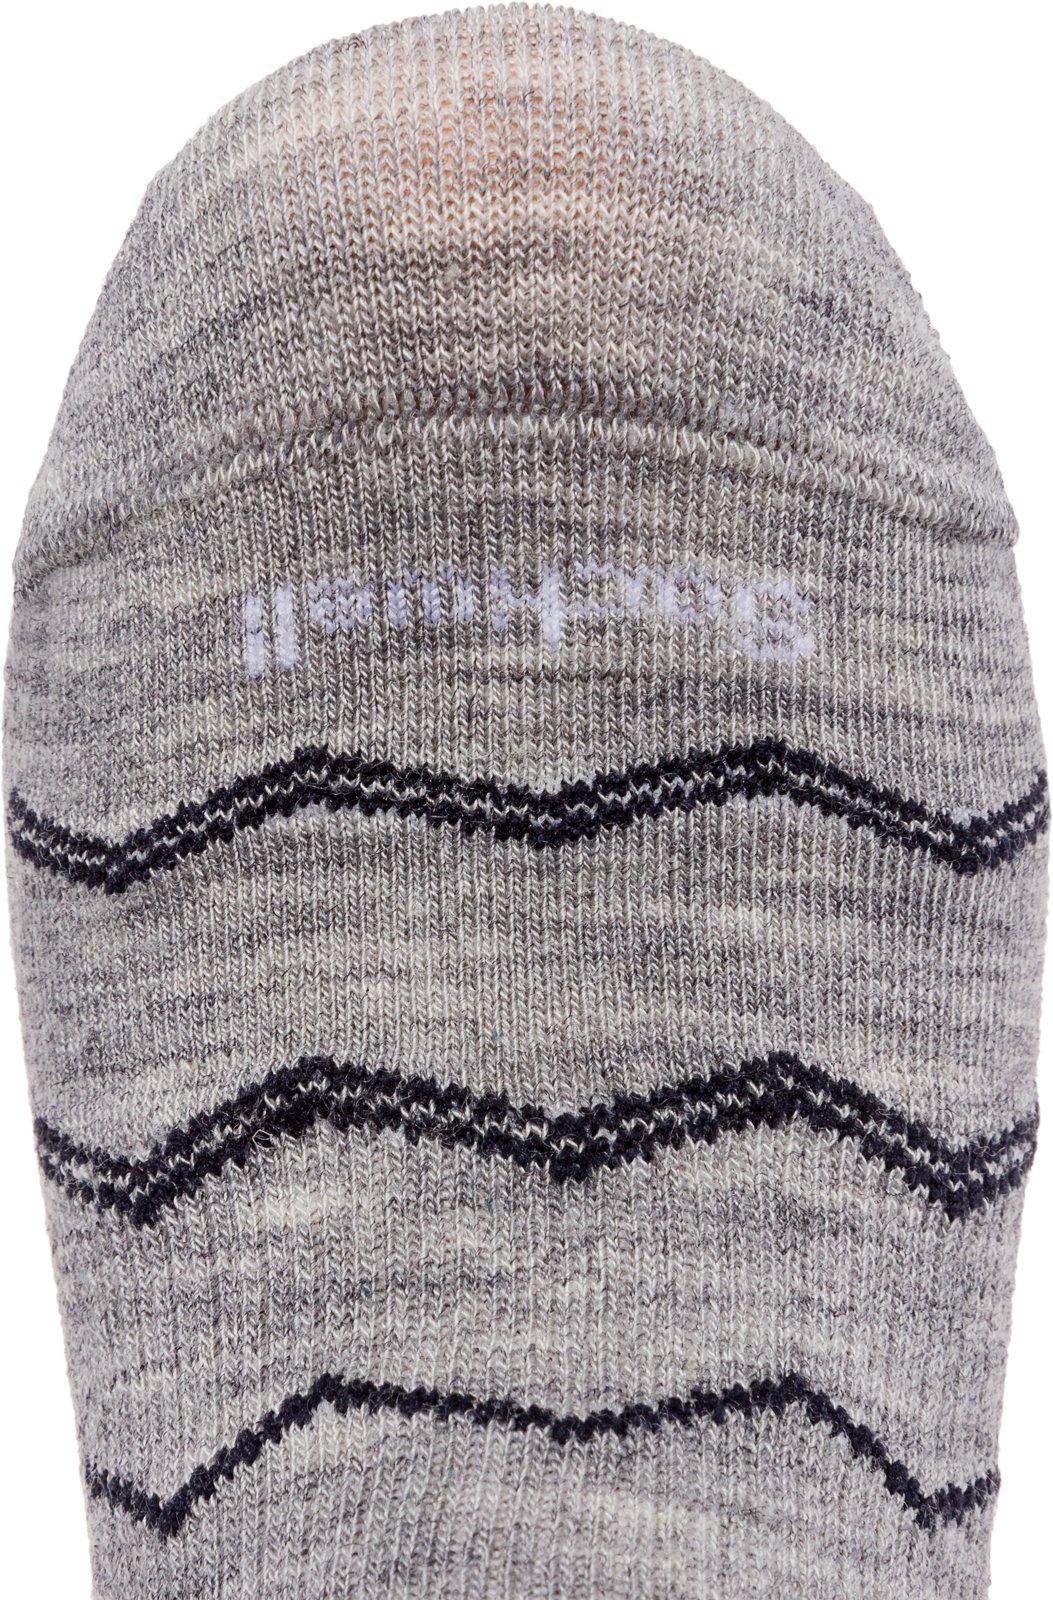 5a1abe1261 Sockwell Women's Plantar Fasciitis Firm Compression Socks, Plantar Quarter  Grey, Medium/Large - SW14W < Compression Socks < Sports & Outdoors - tibs